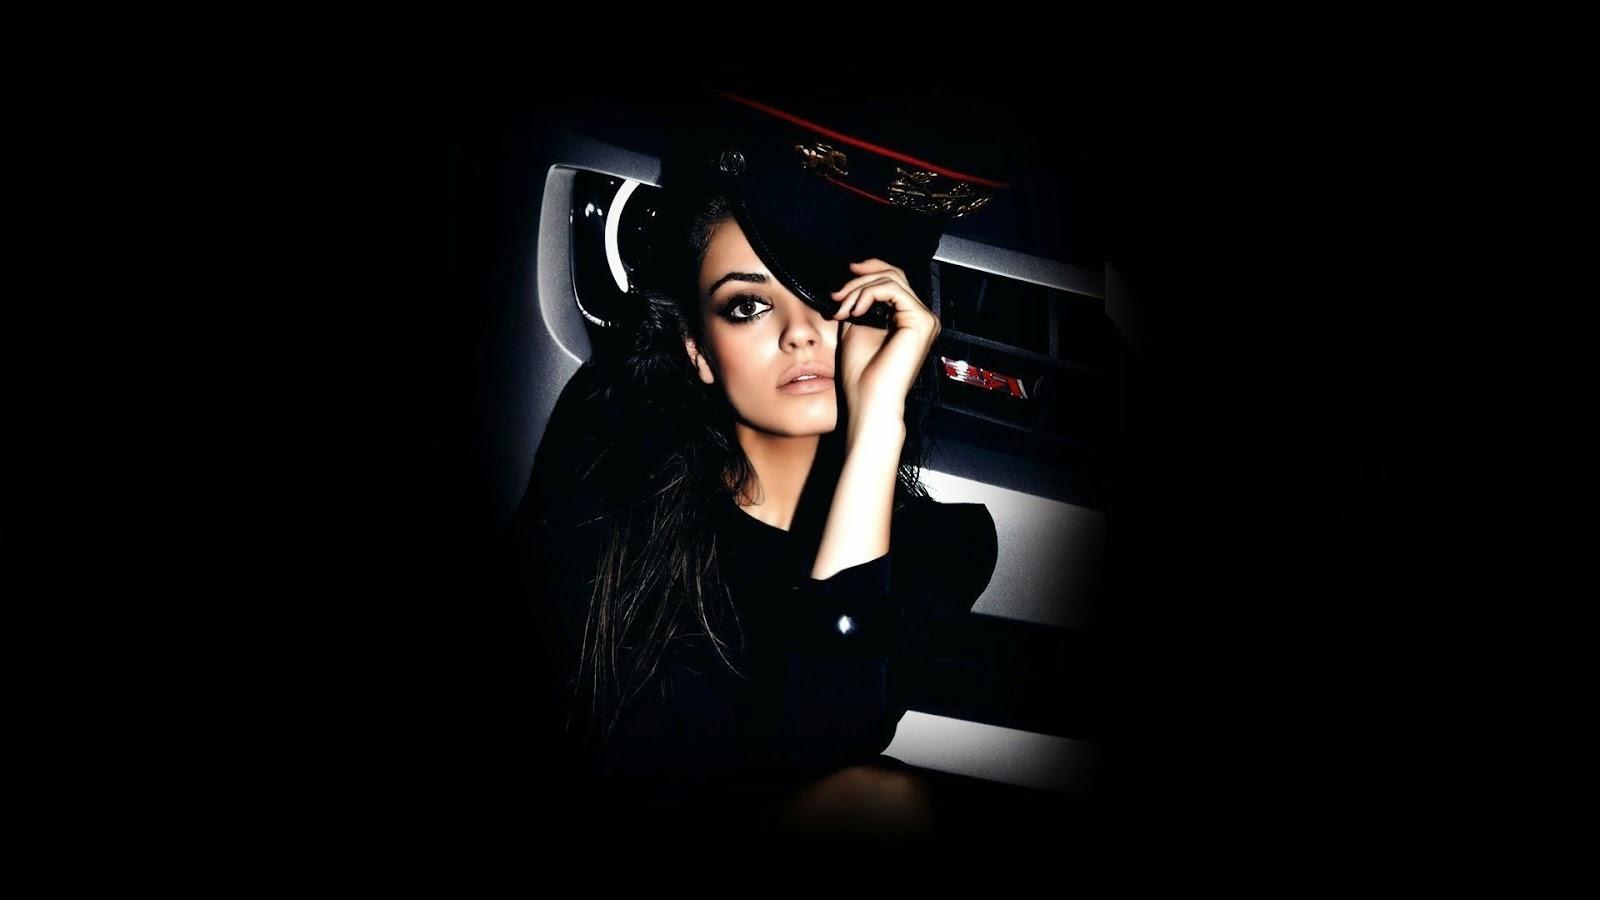 Mila Kunis Hd Wallpapers Free Download